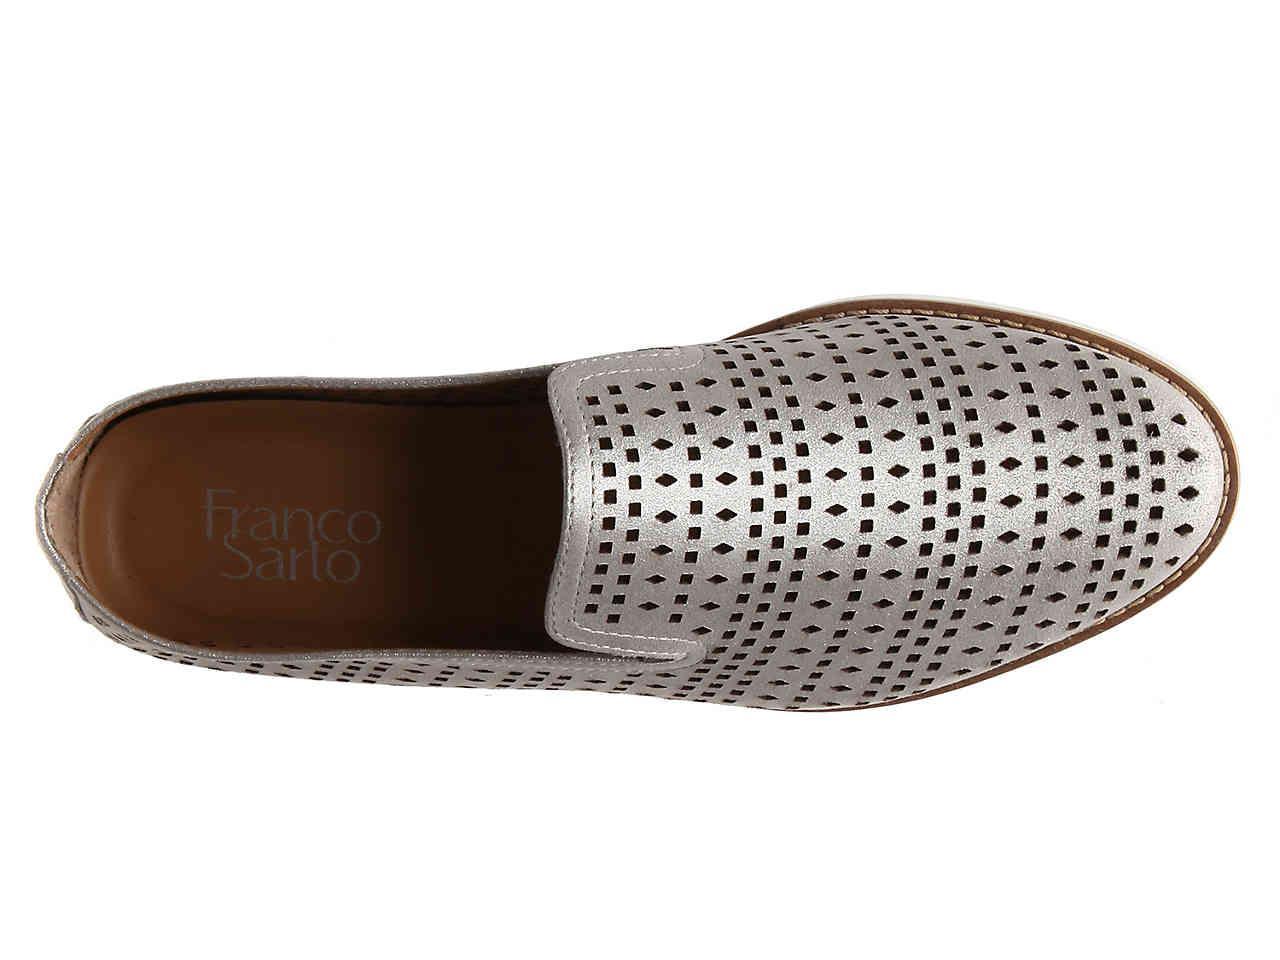 dbf149abb33f Lyst - Franco Sarto Florie Platform Loafer in Metallic